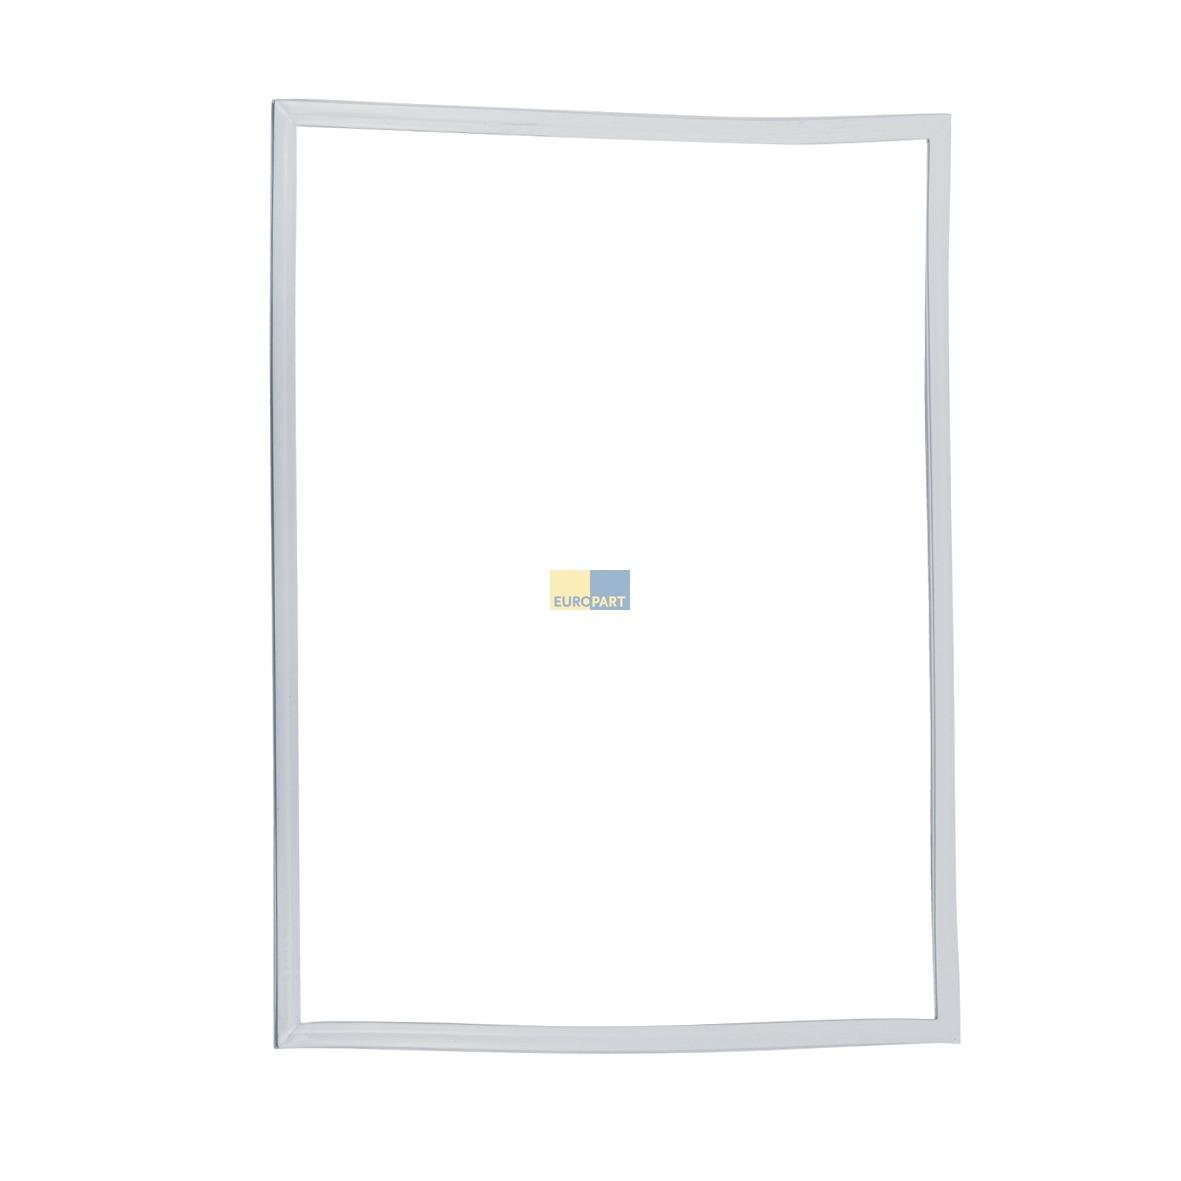 Türdichtung BOSCH 00710950 Original zu Kühlschrank - ABEA Hausgeräte ...